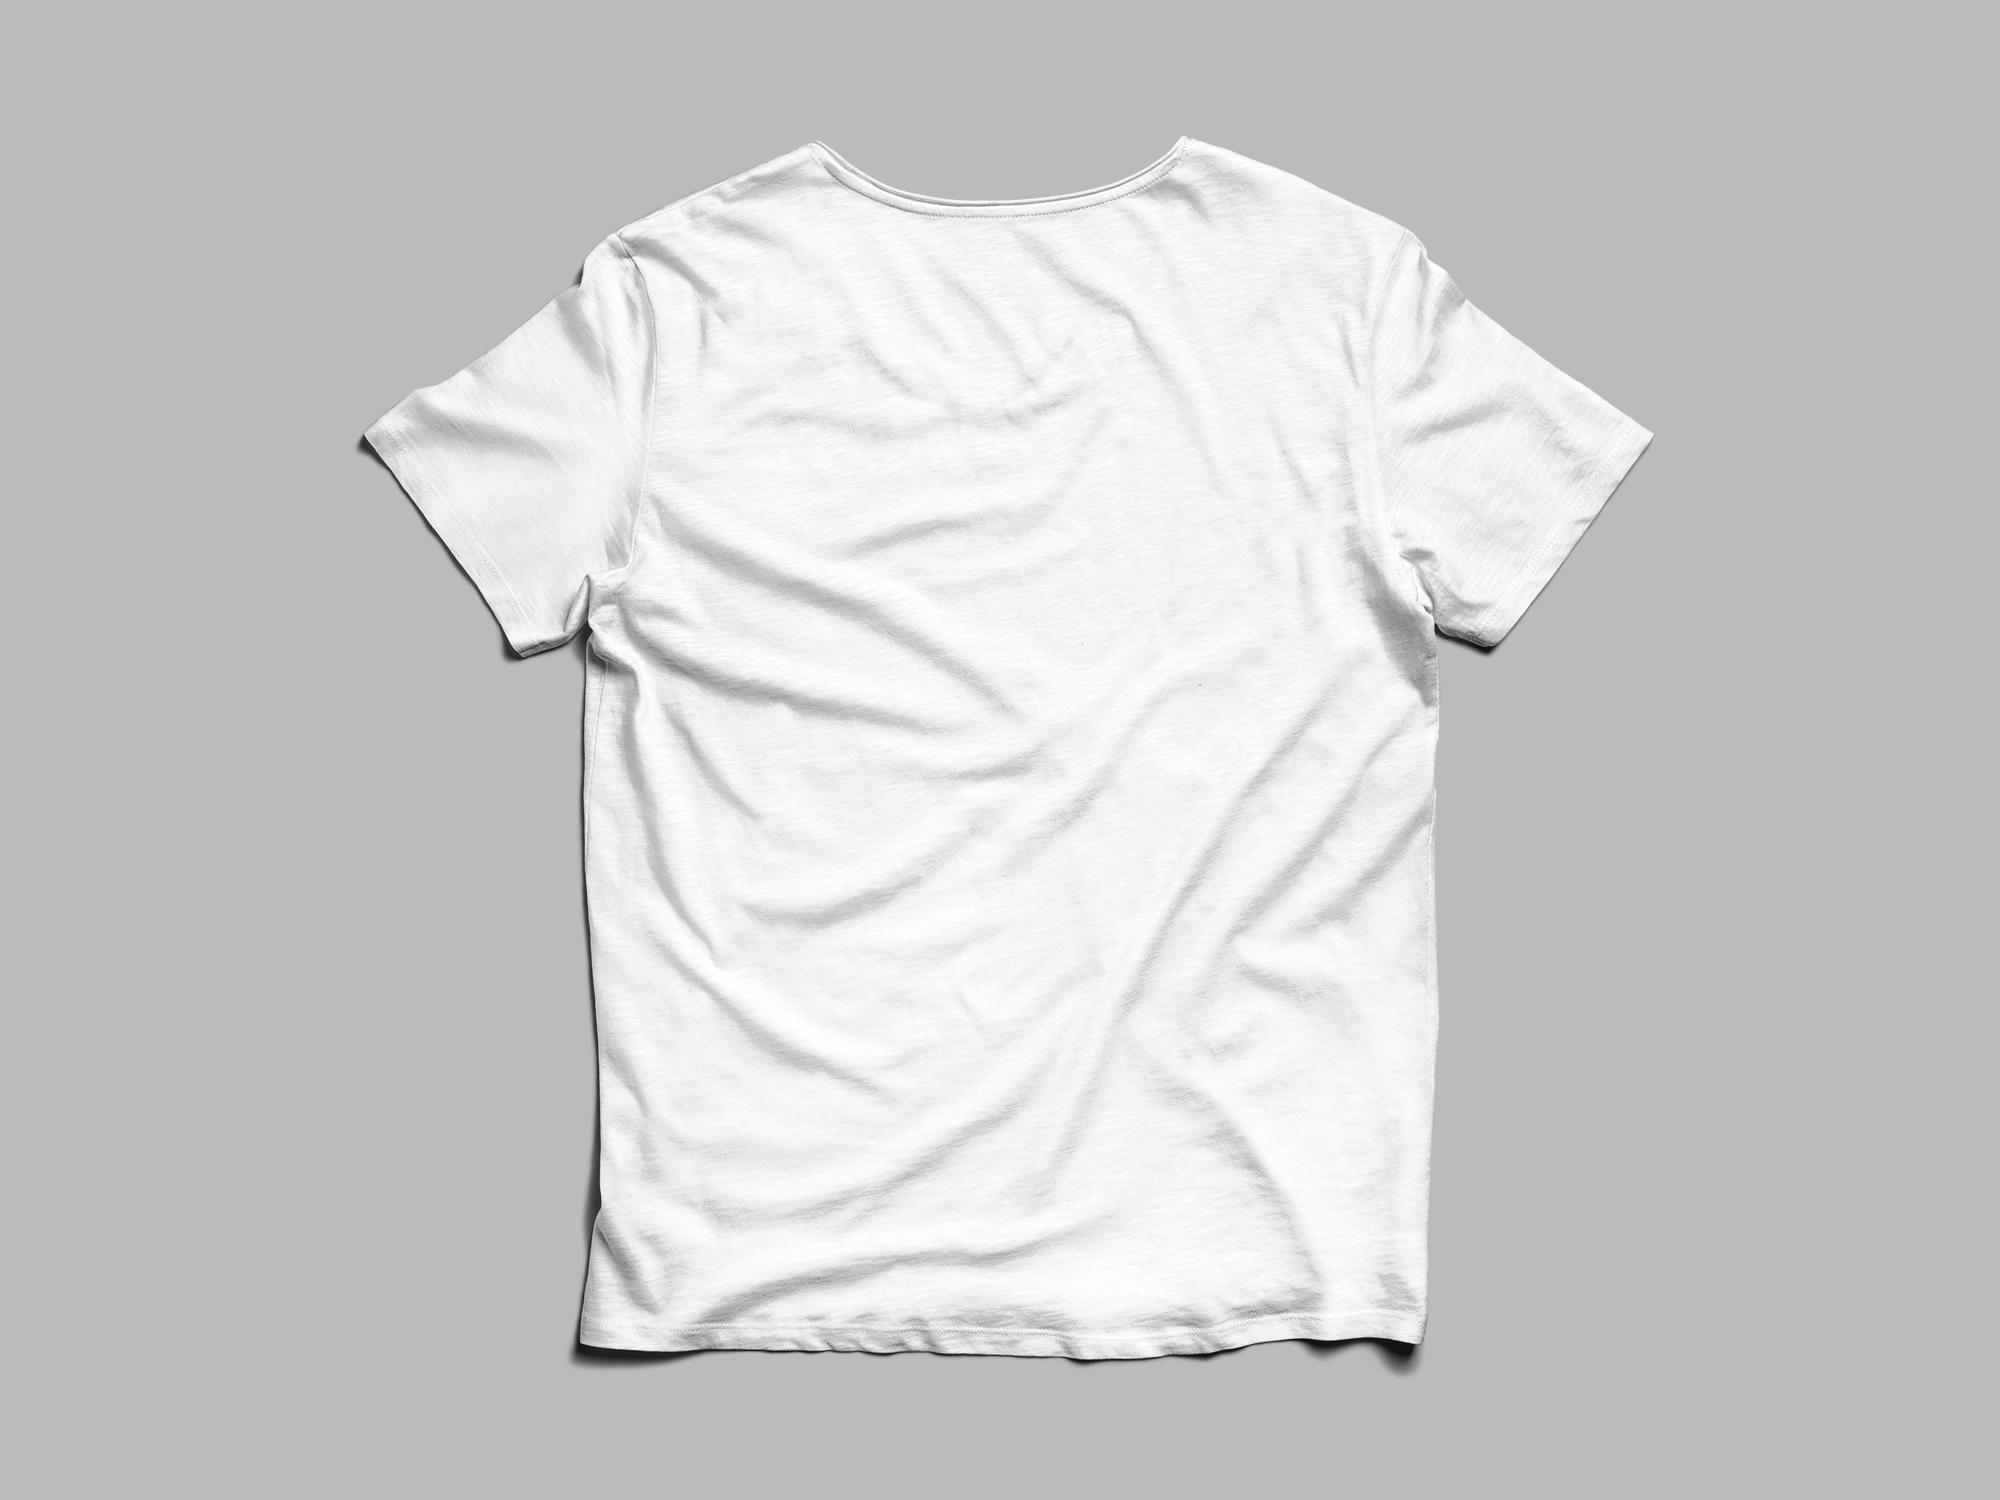 T Shirt Front And Back Mockup The Mockup Club